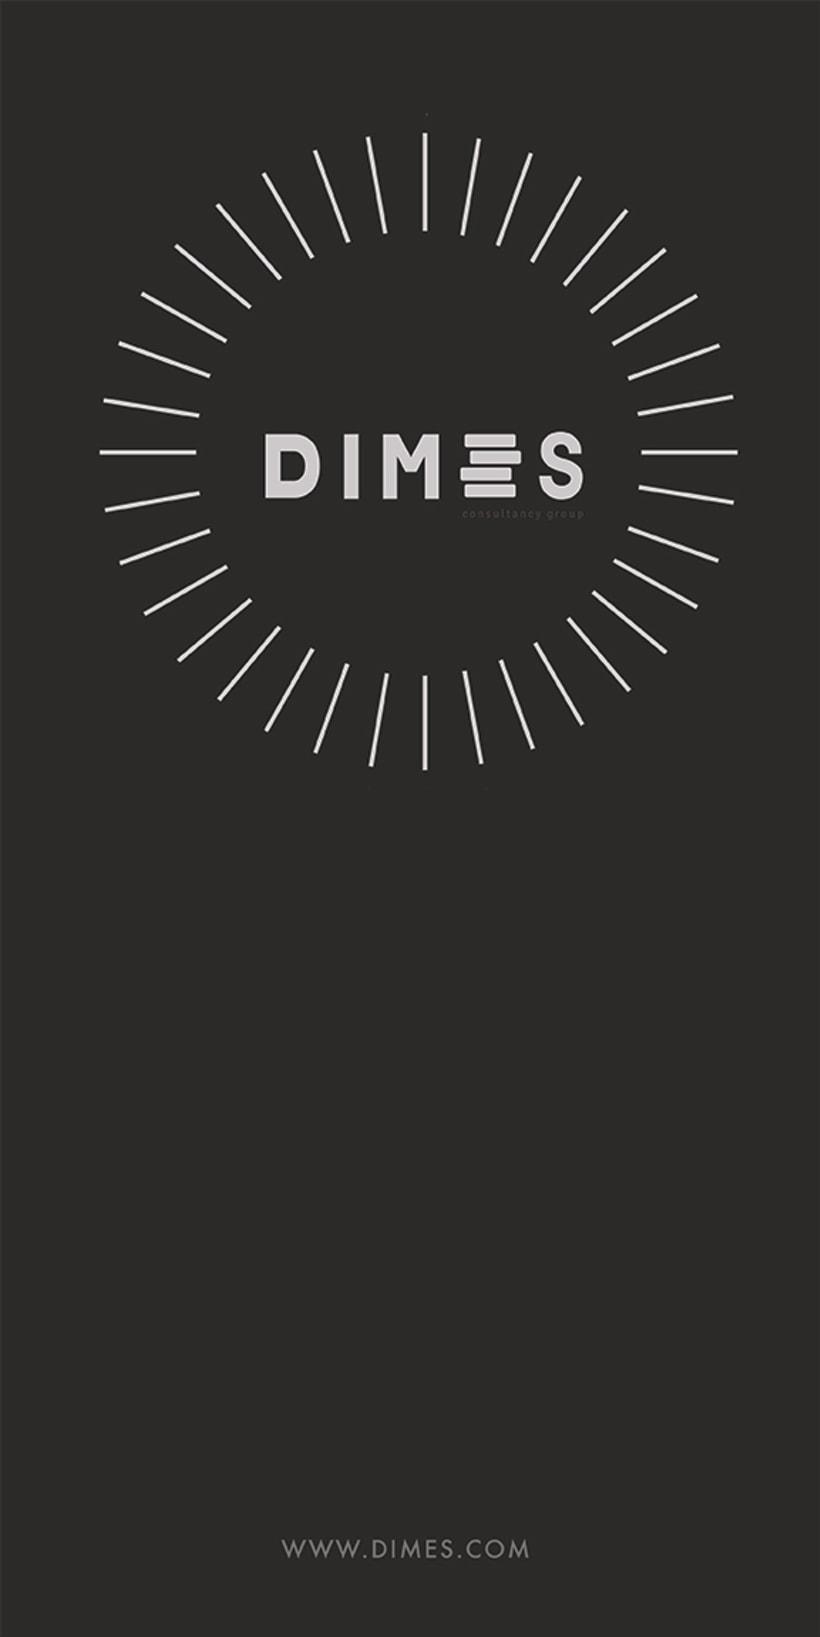 Dimes / Céntimos 7